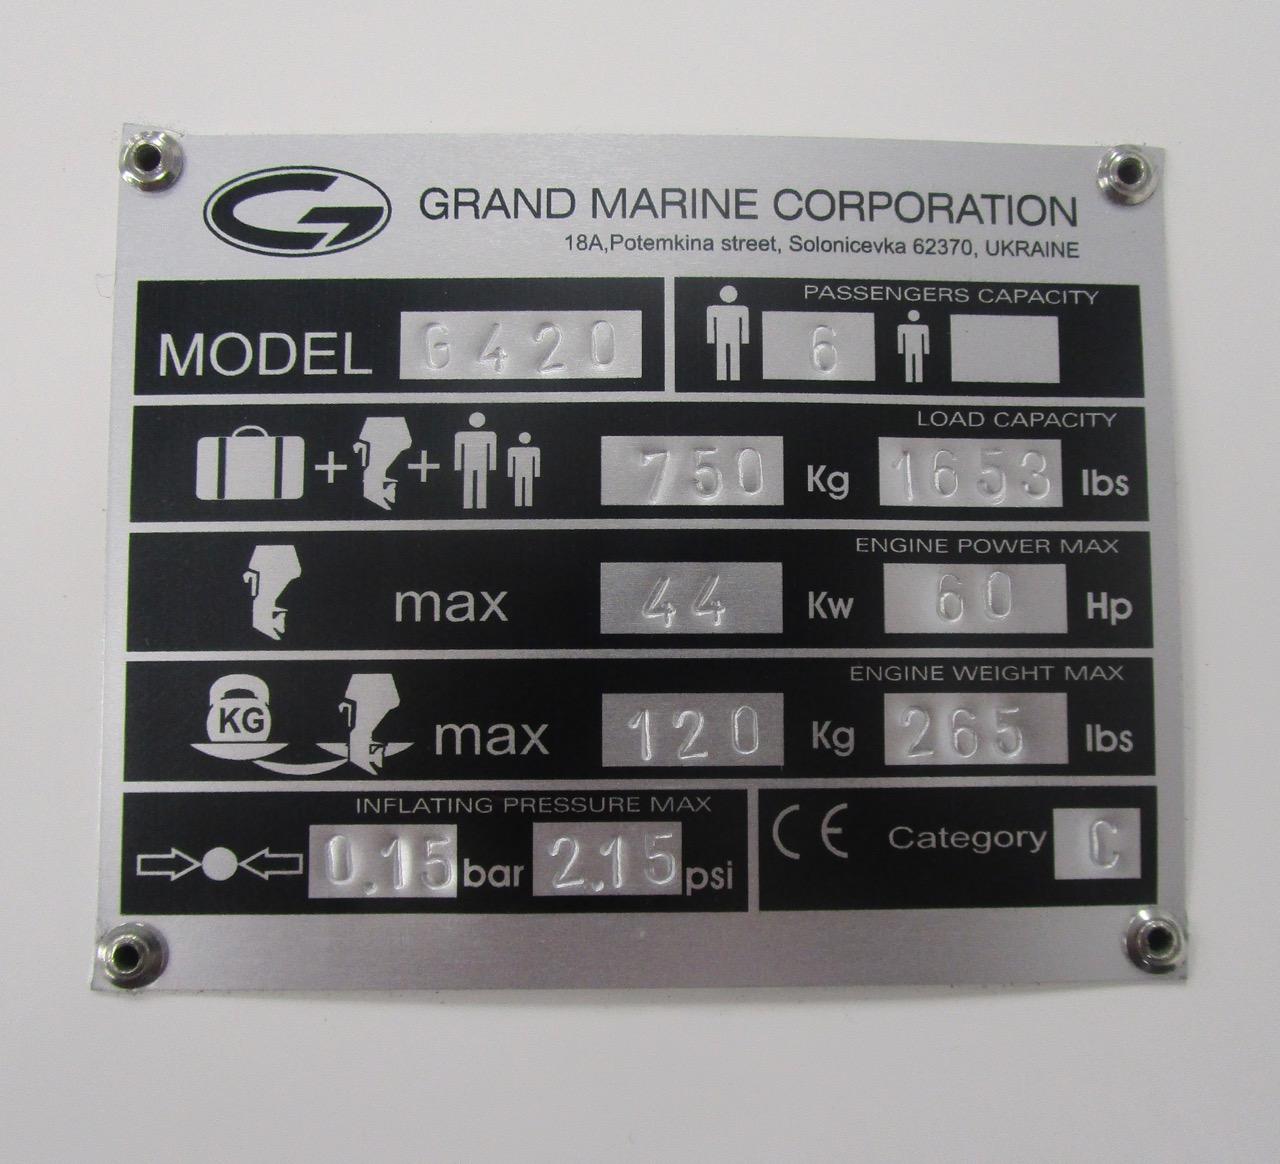 GRAND Golden Line G420 RIB CE plate